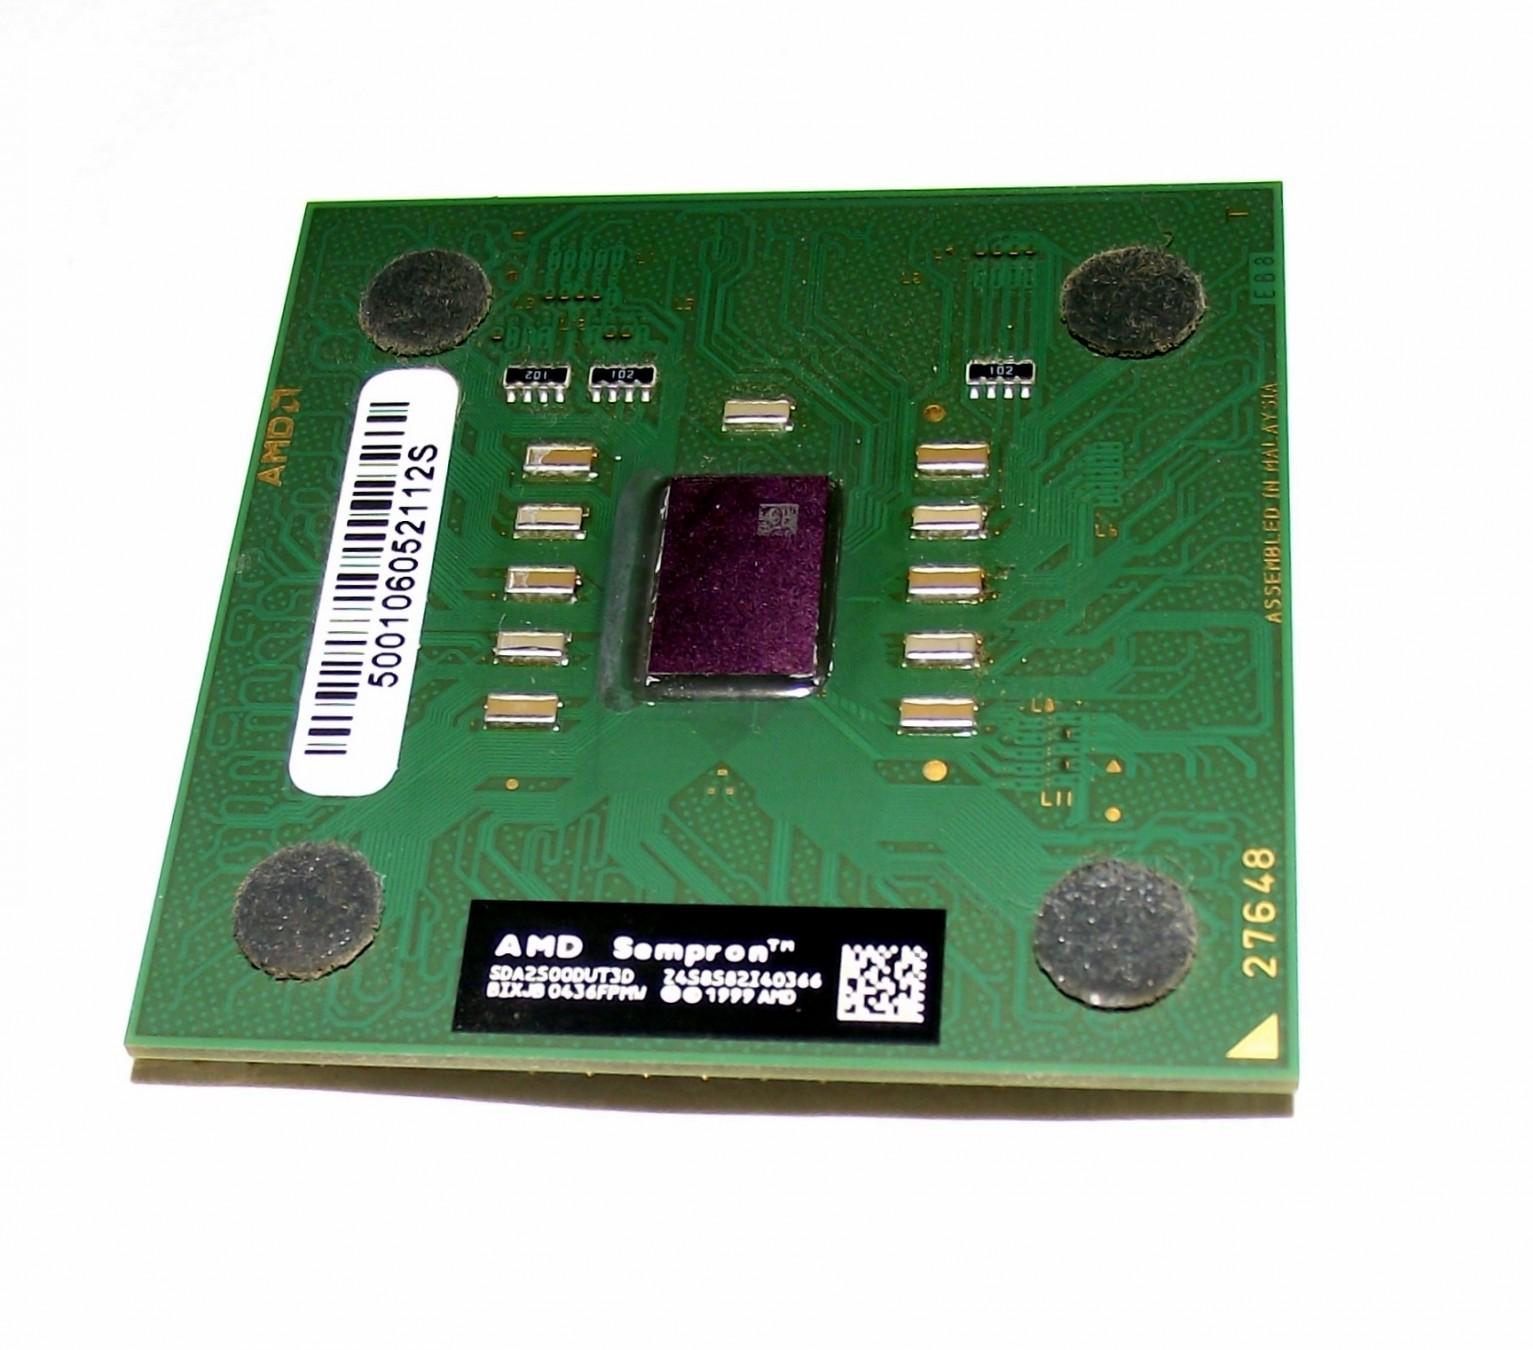 DRIVER UPDATE: AMD SEMPRON 2500+